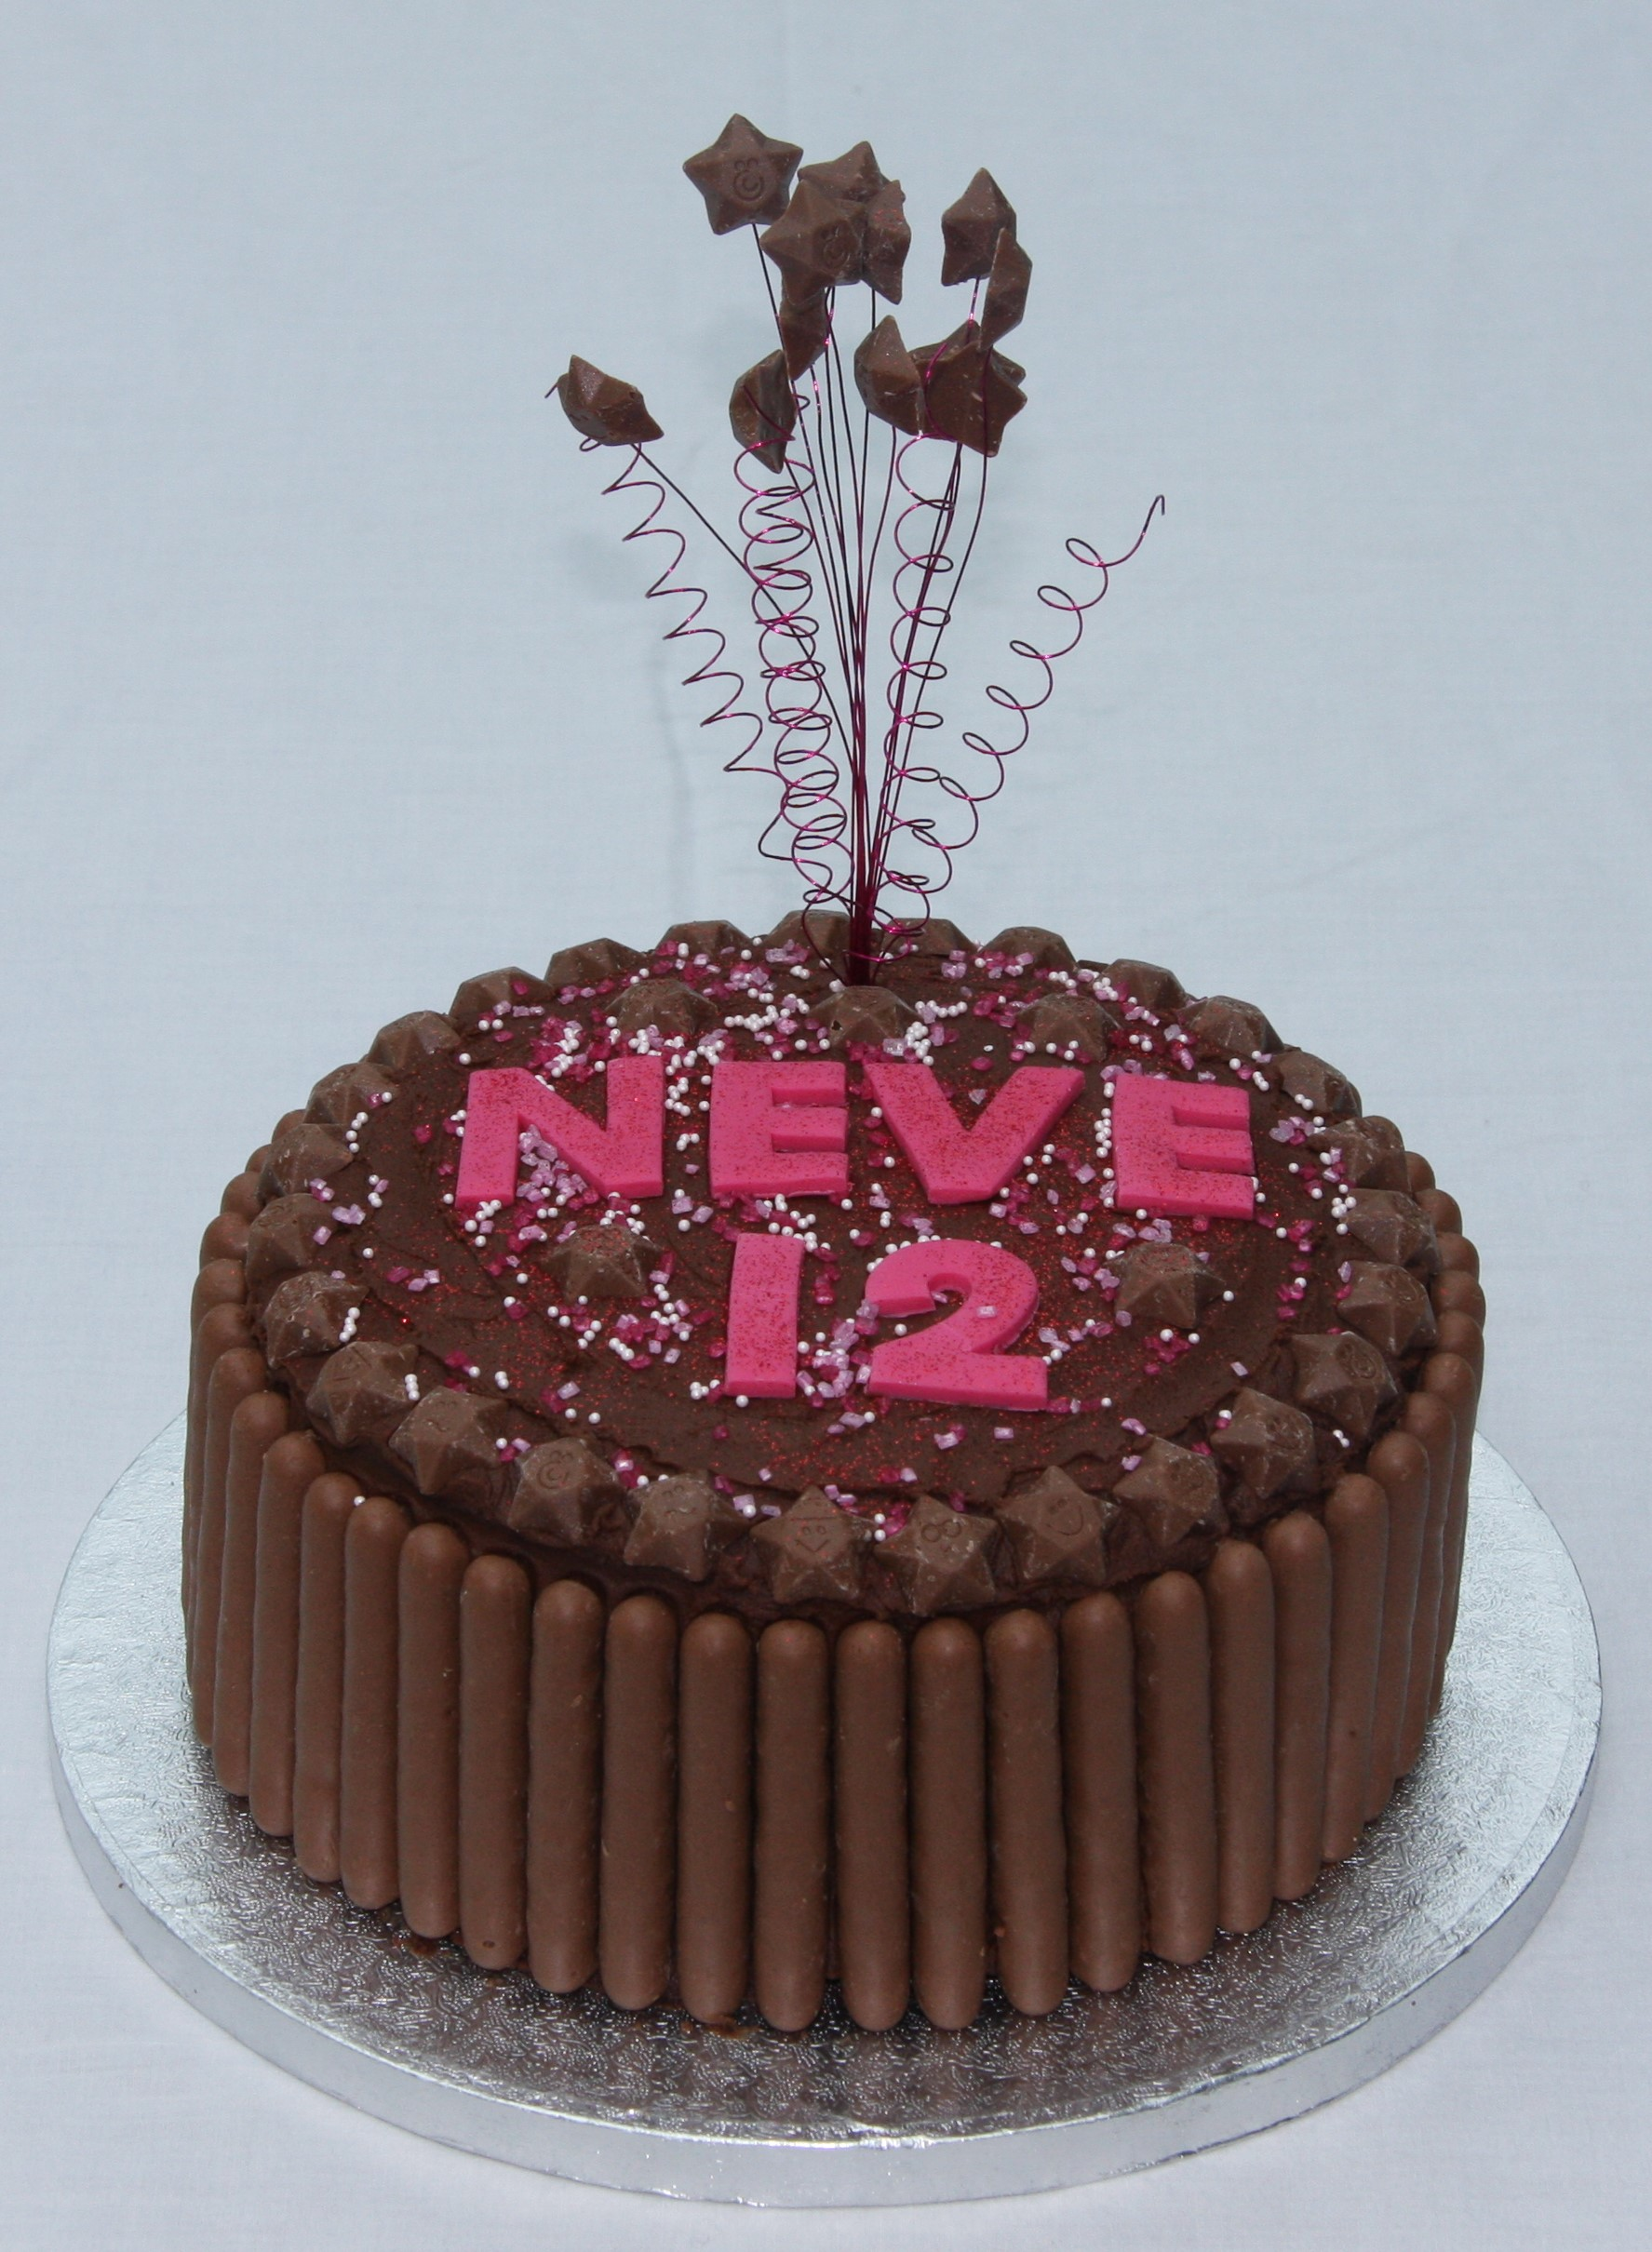 Chocolate Birthday Cakes Variations On A Theme